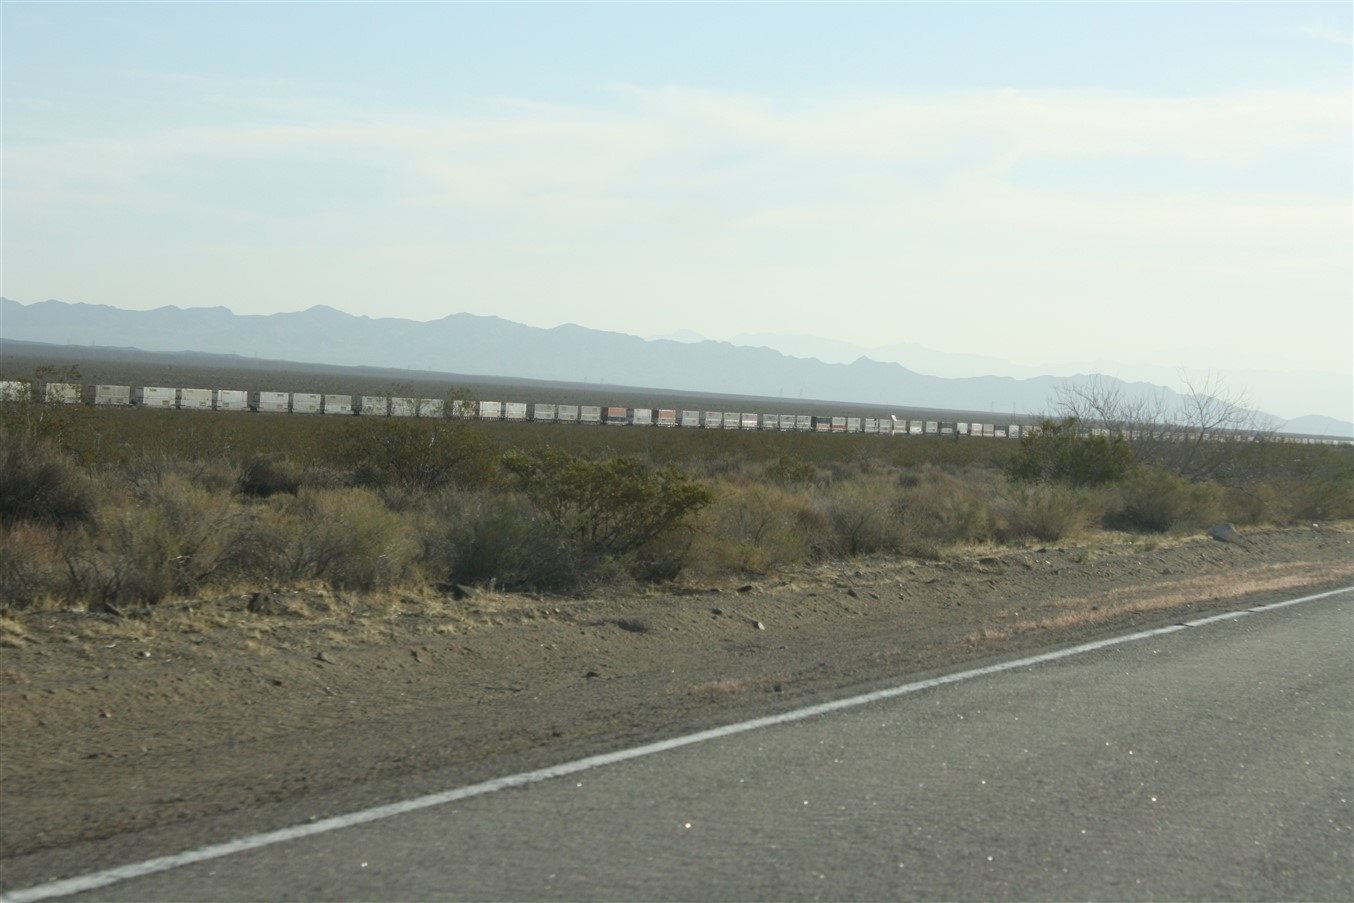 2012 03 14 Route 66 Road Trip 56 California Desert.jpg